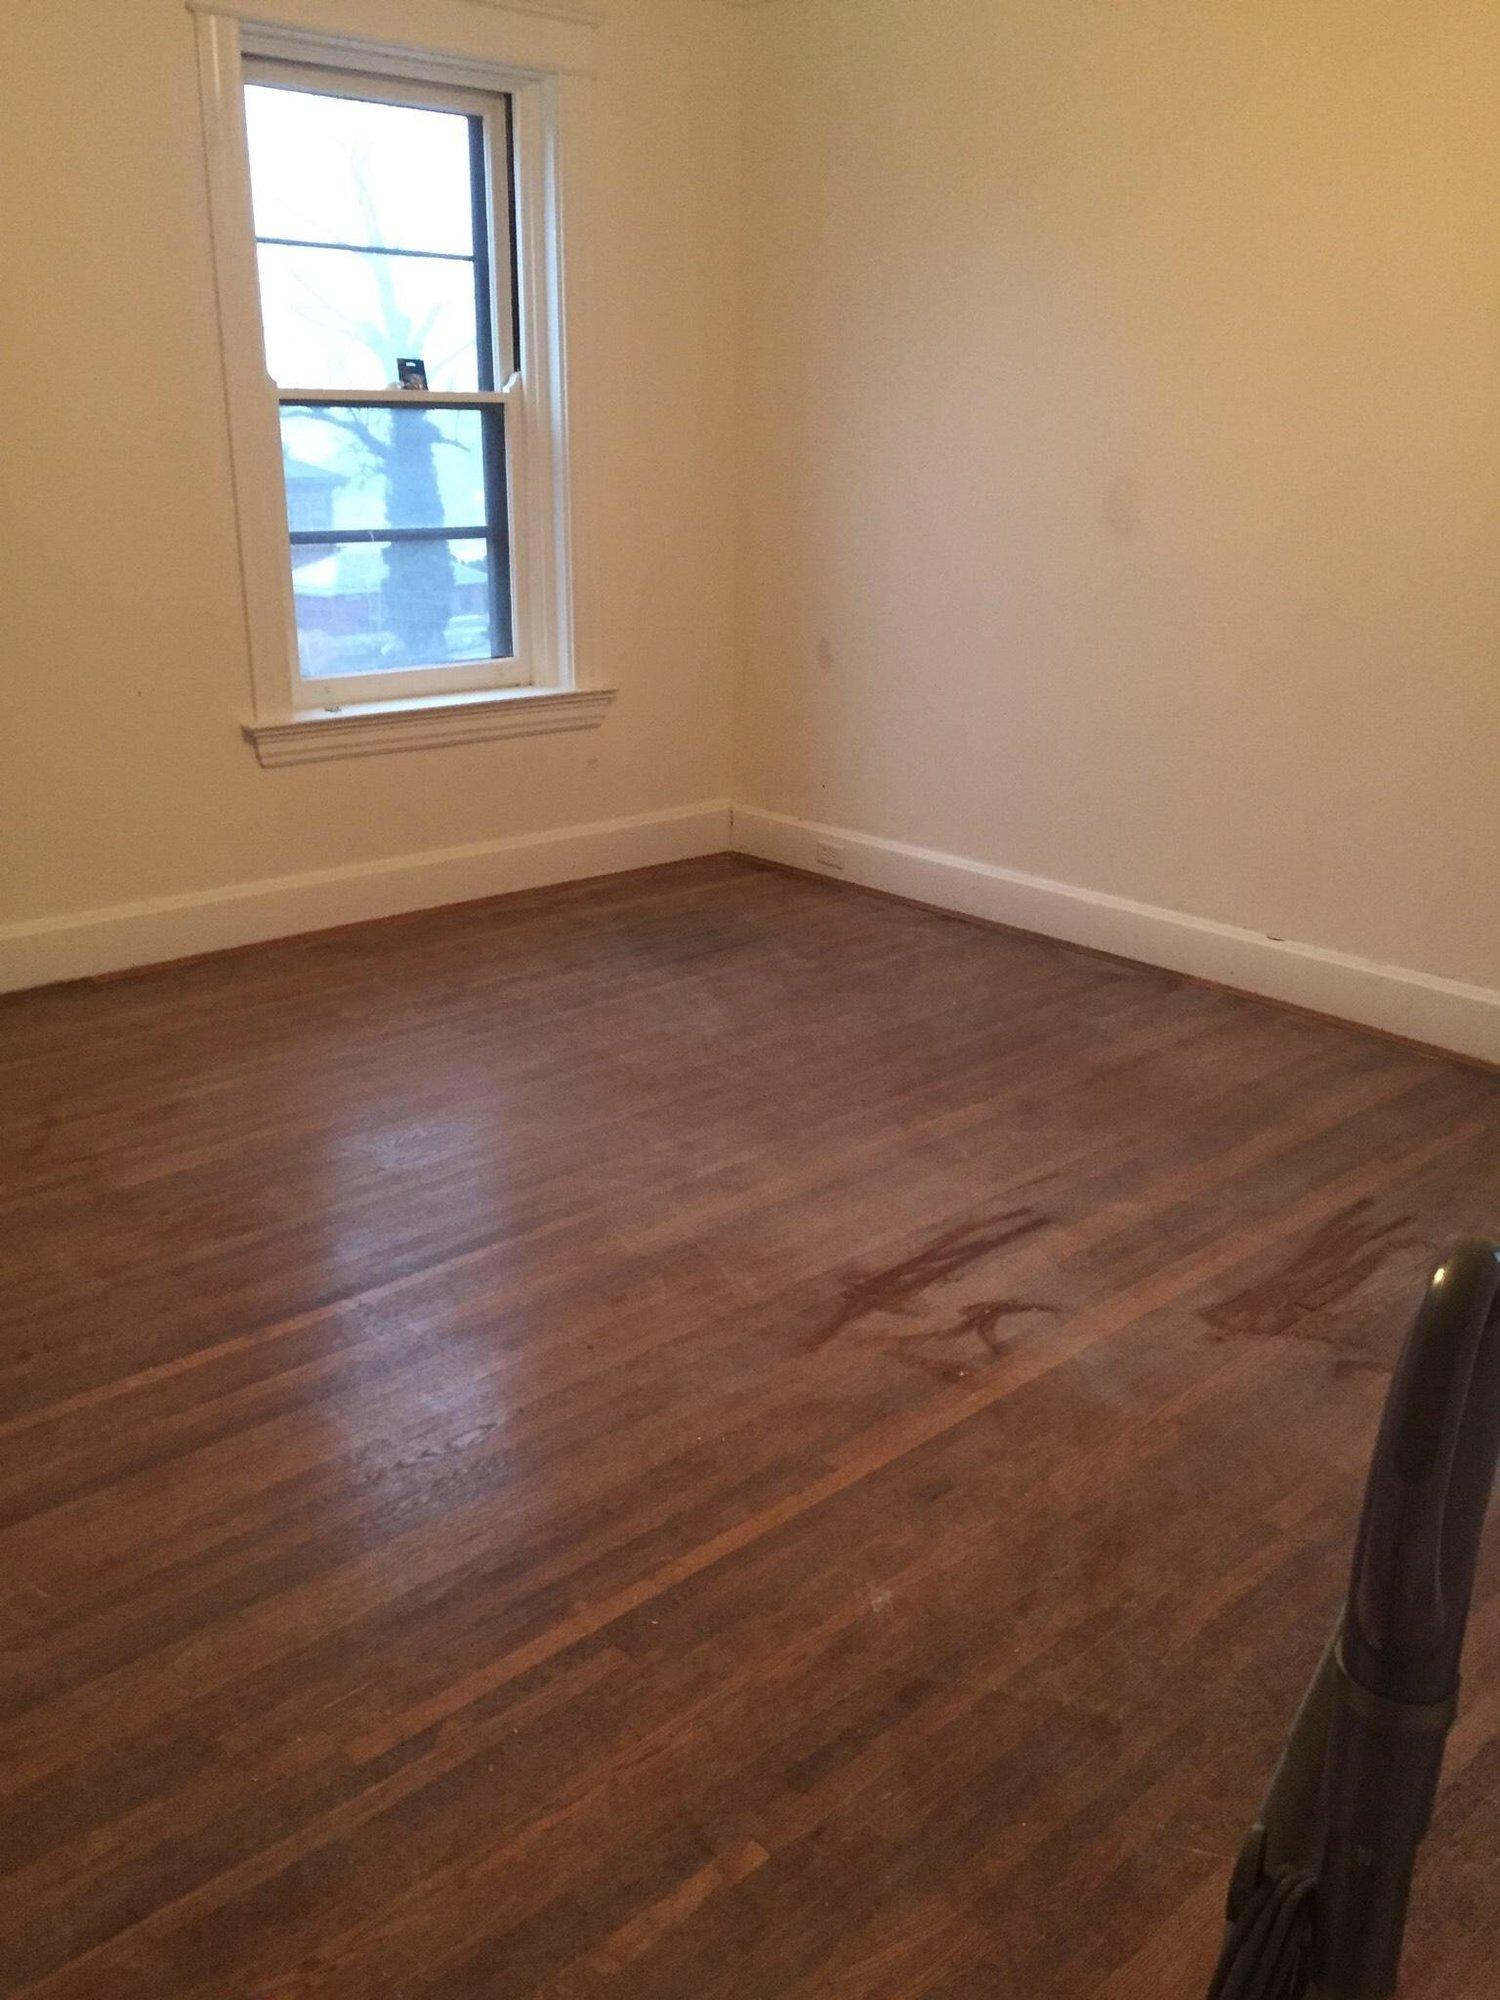 Hardwood Floords - Before